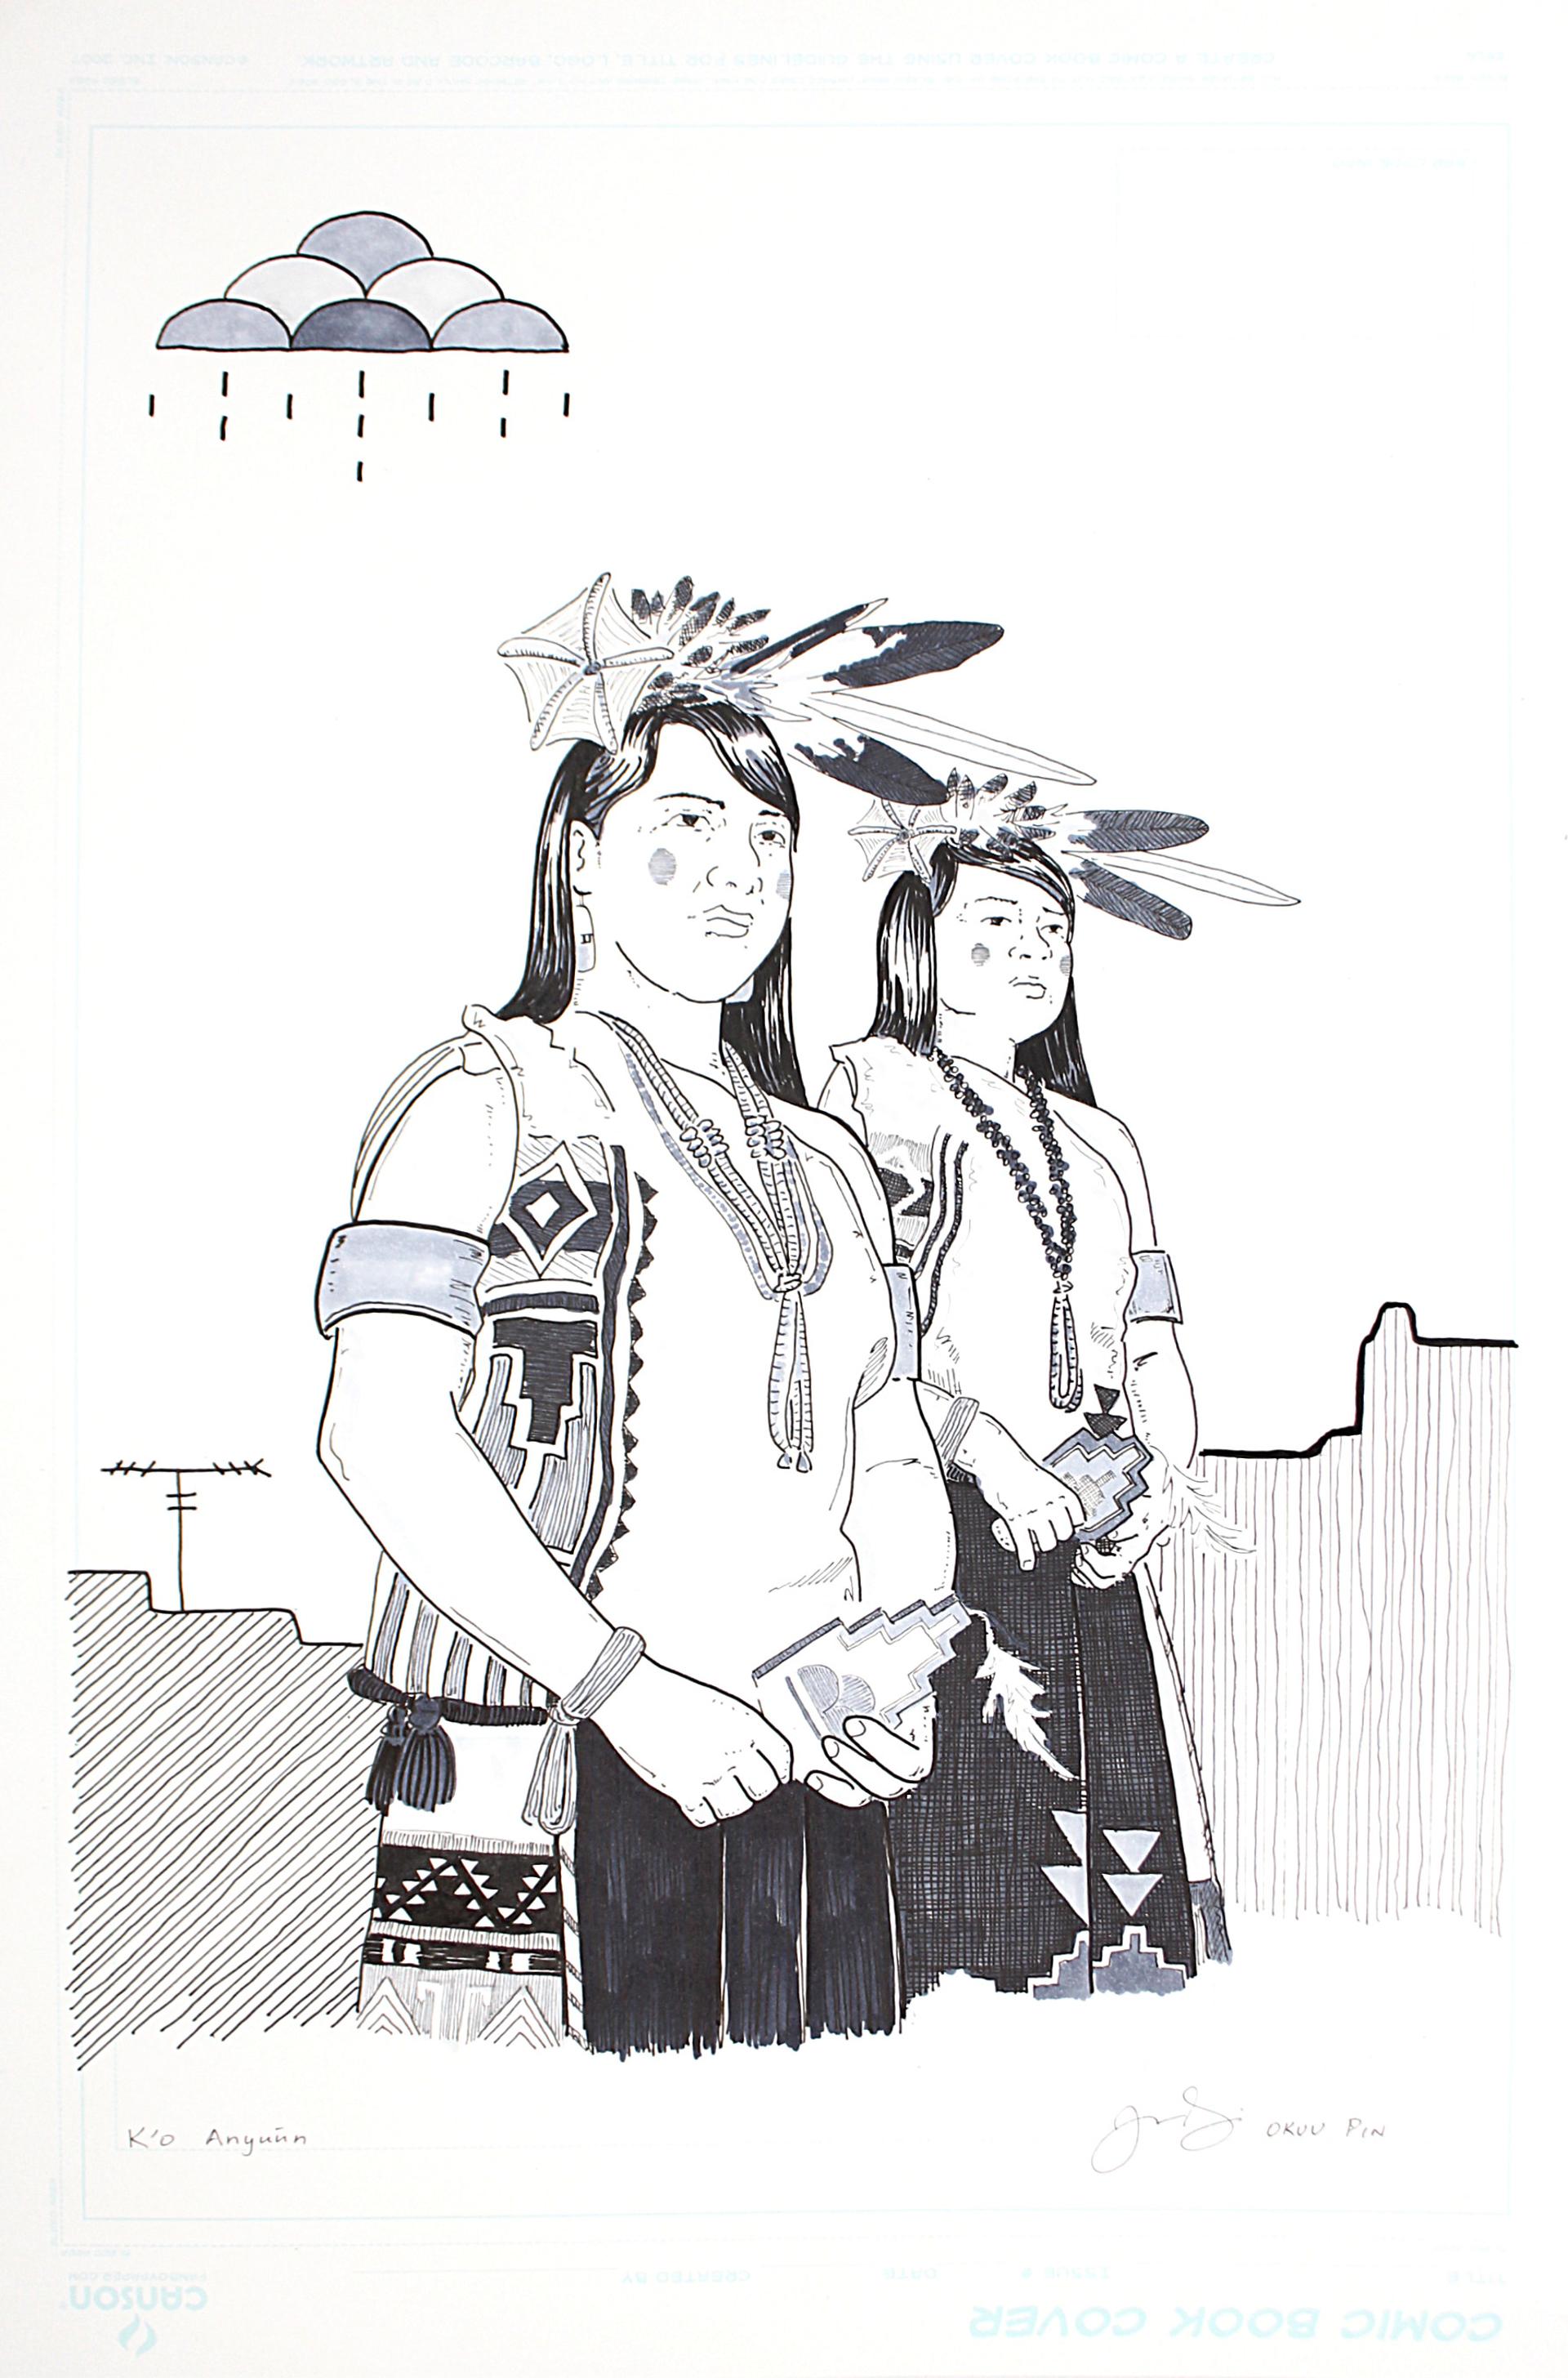 K'o Anyuún by Jason Garcia